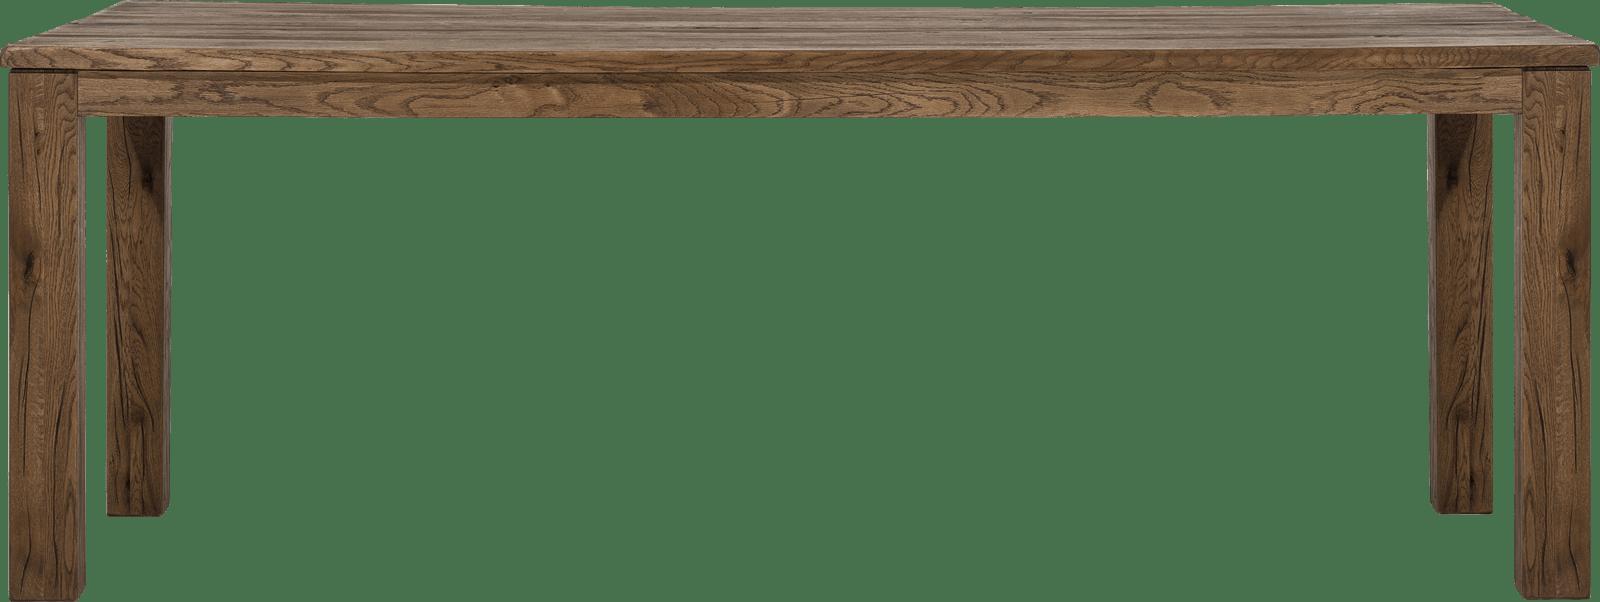 Masters - eetkamertafel 220 x 100 cm - hout 9x9